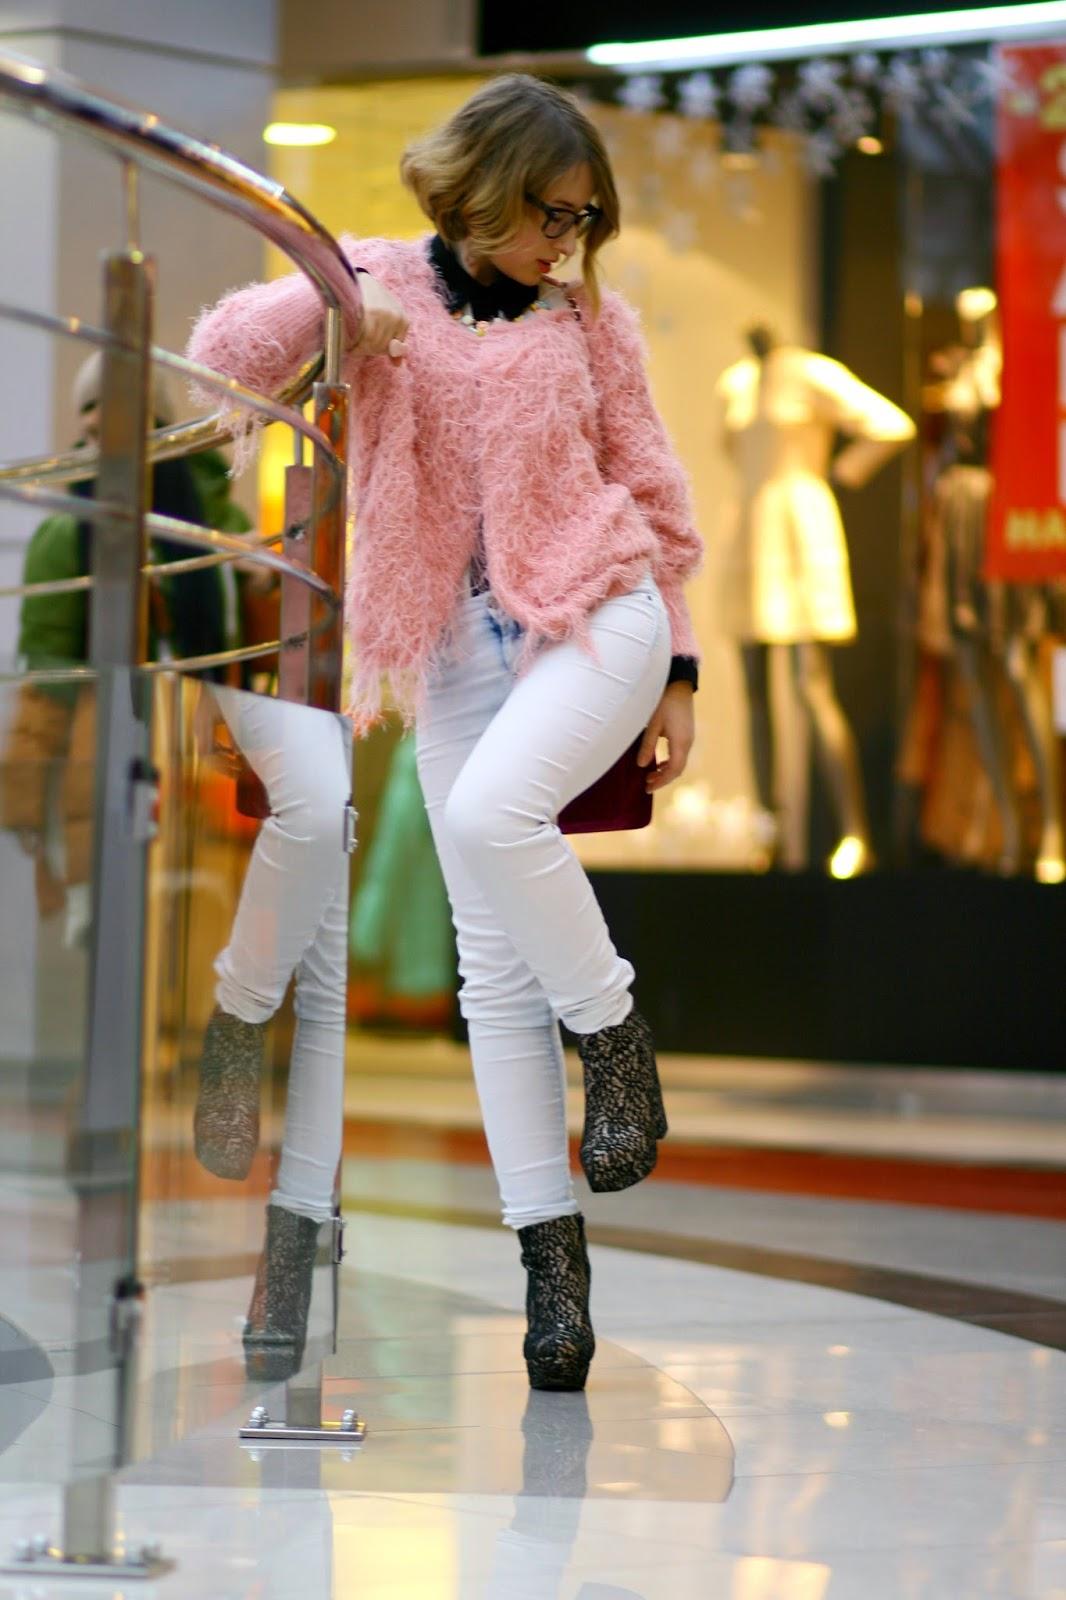 Anvil 880 Ladies 4.5 oz. Ringspun Cotton Fashion Fit T-Shirt 5